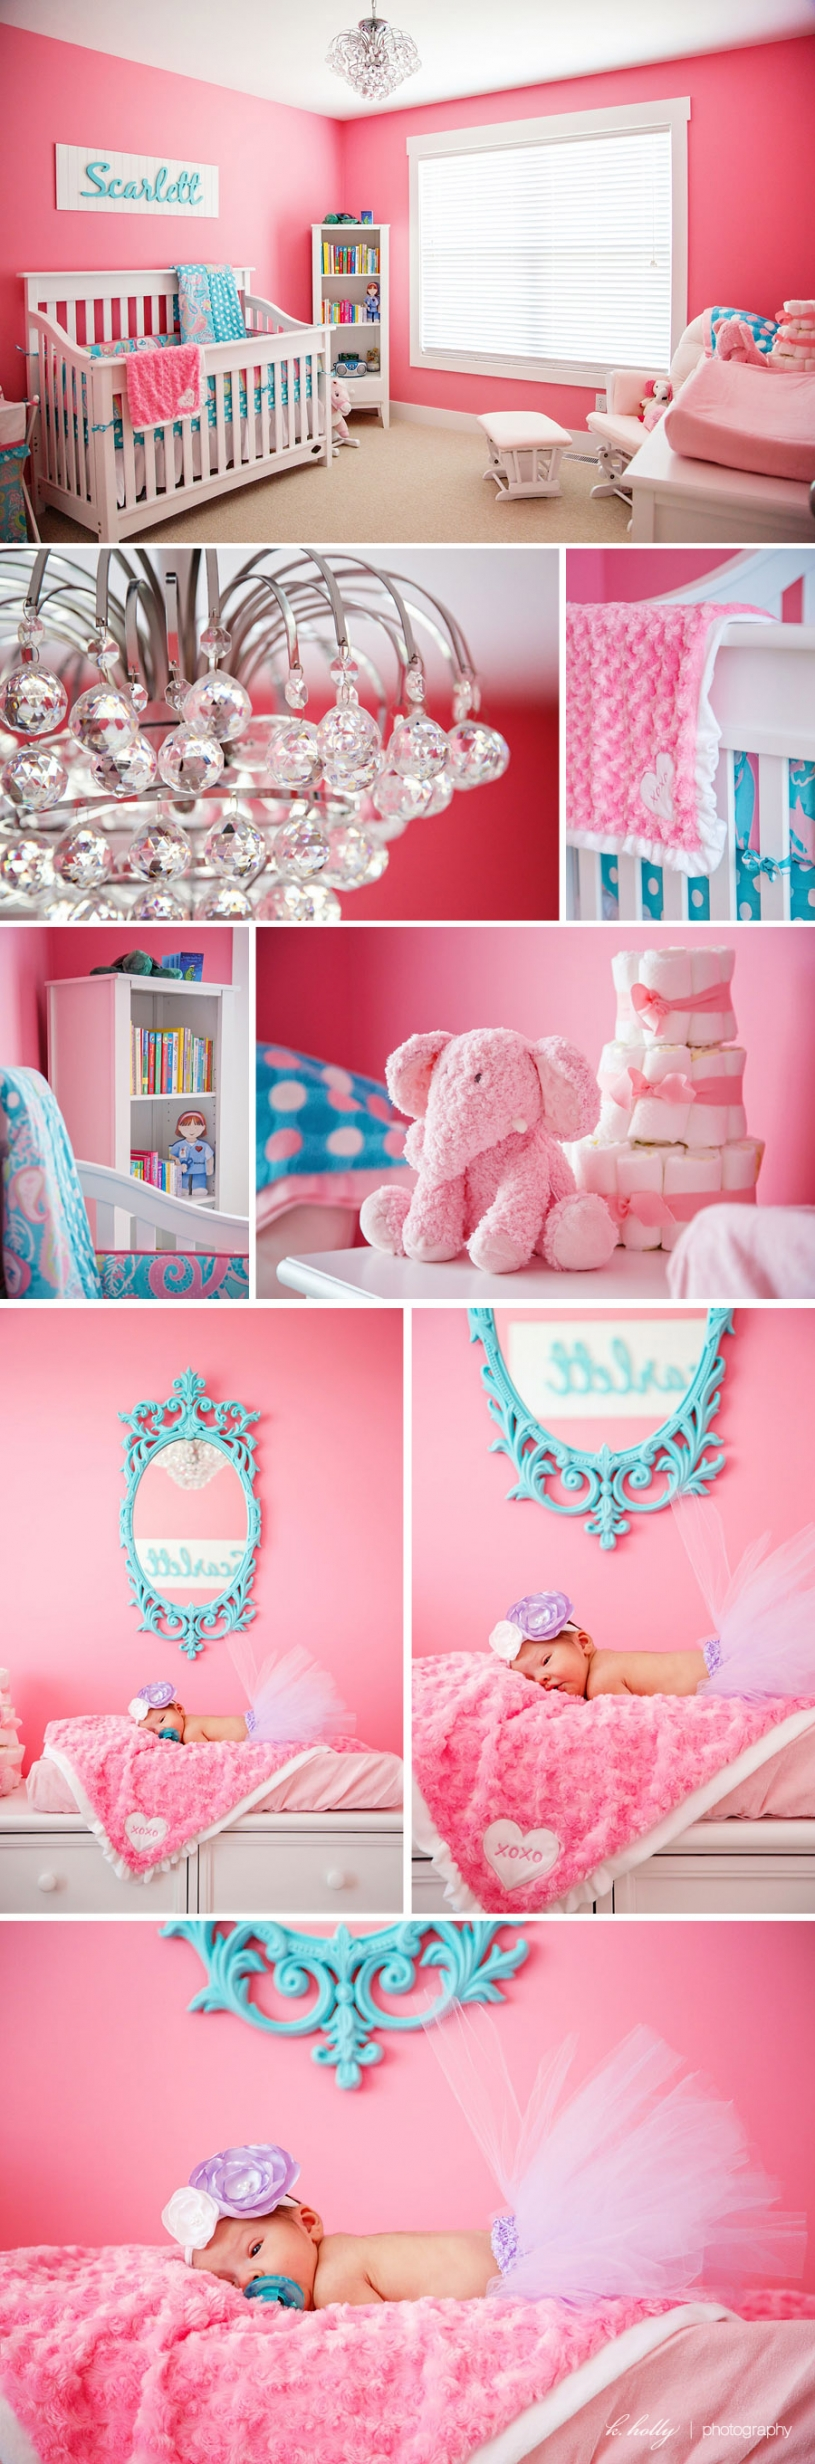 My Baby Girl S Nursery: Scarlett :: Newborn THis Is The Baby Room Haley LOVES! It